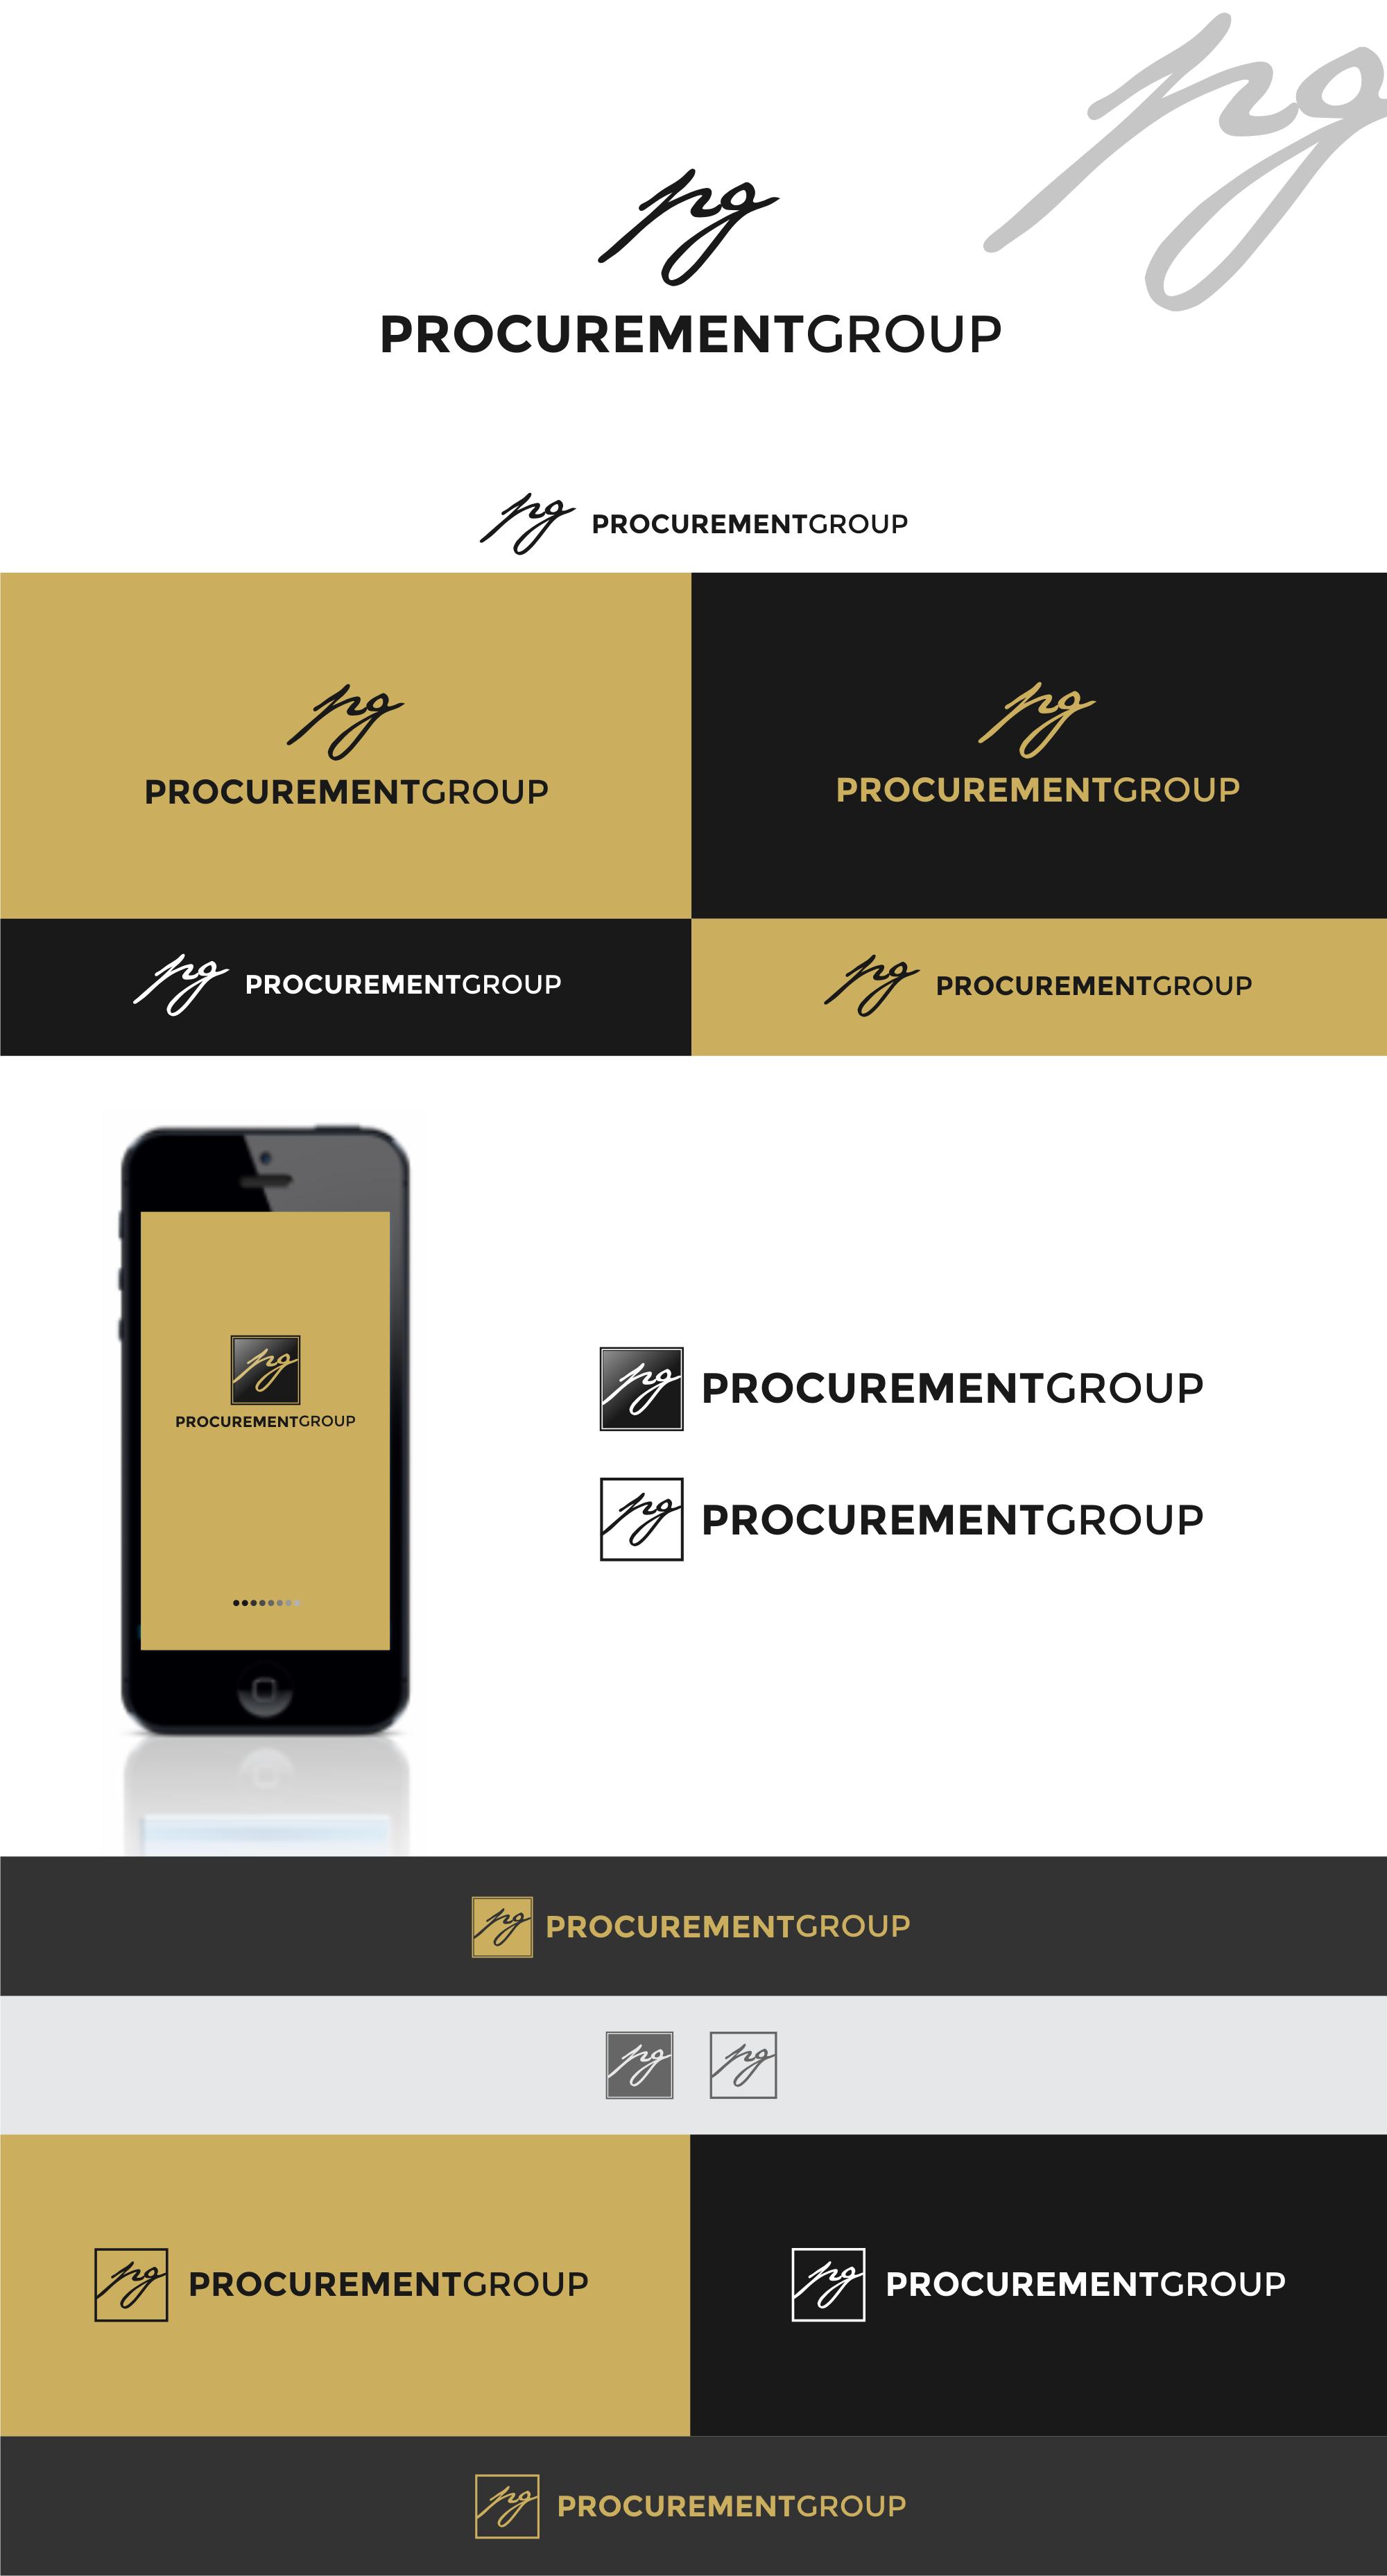 Luxury, Black Card-esque membership organization